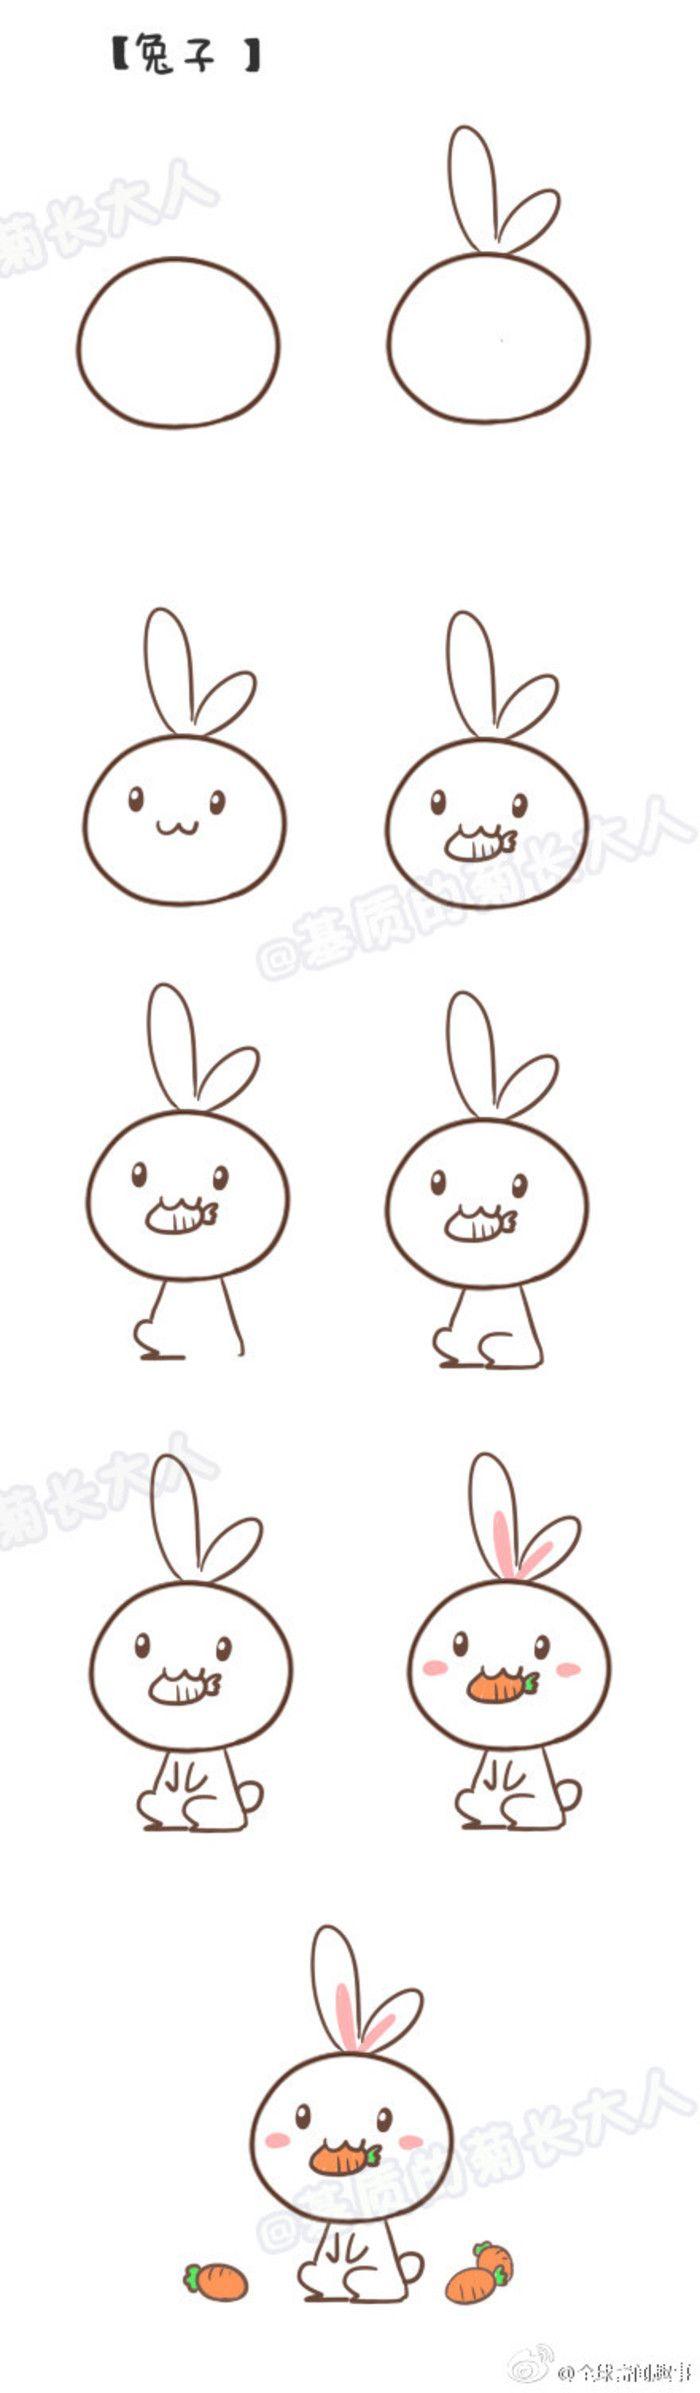 Le enseñará a dibujar un círculo grupo permanecer Meng animales pequeños…